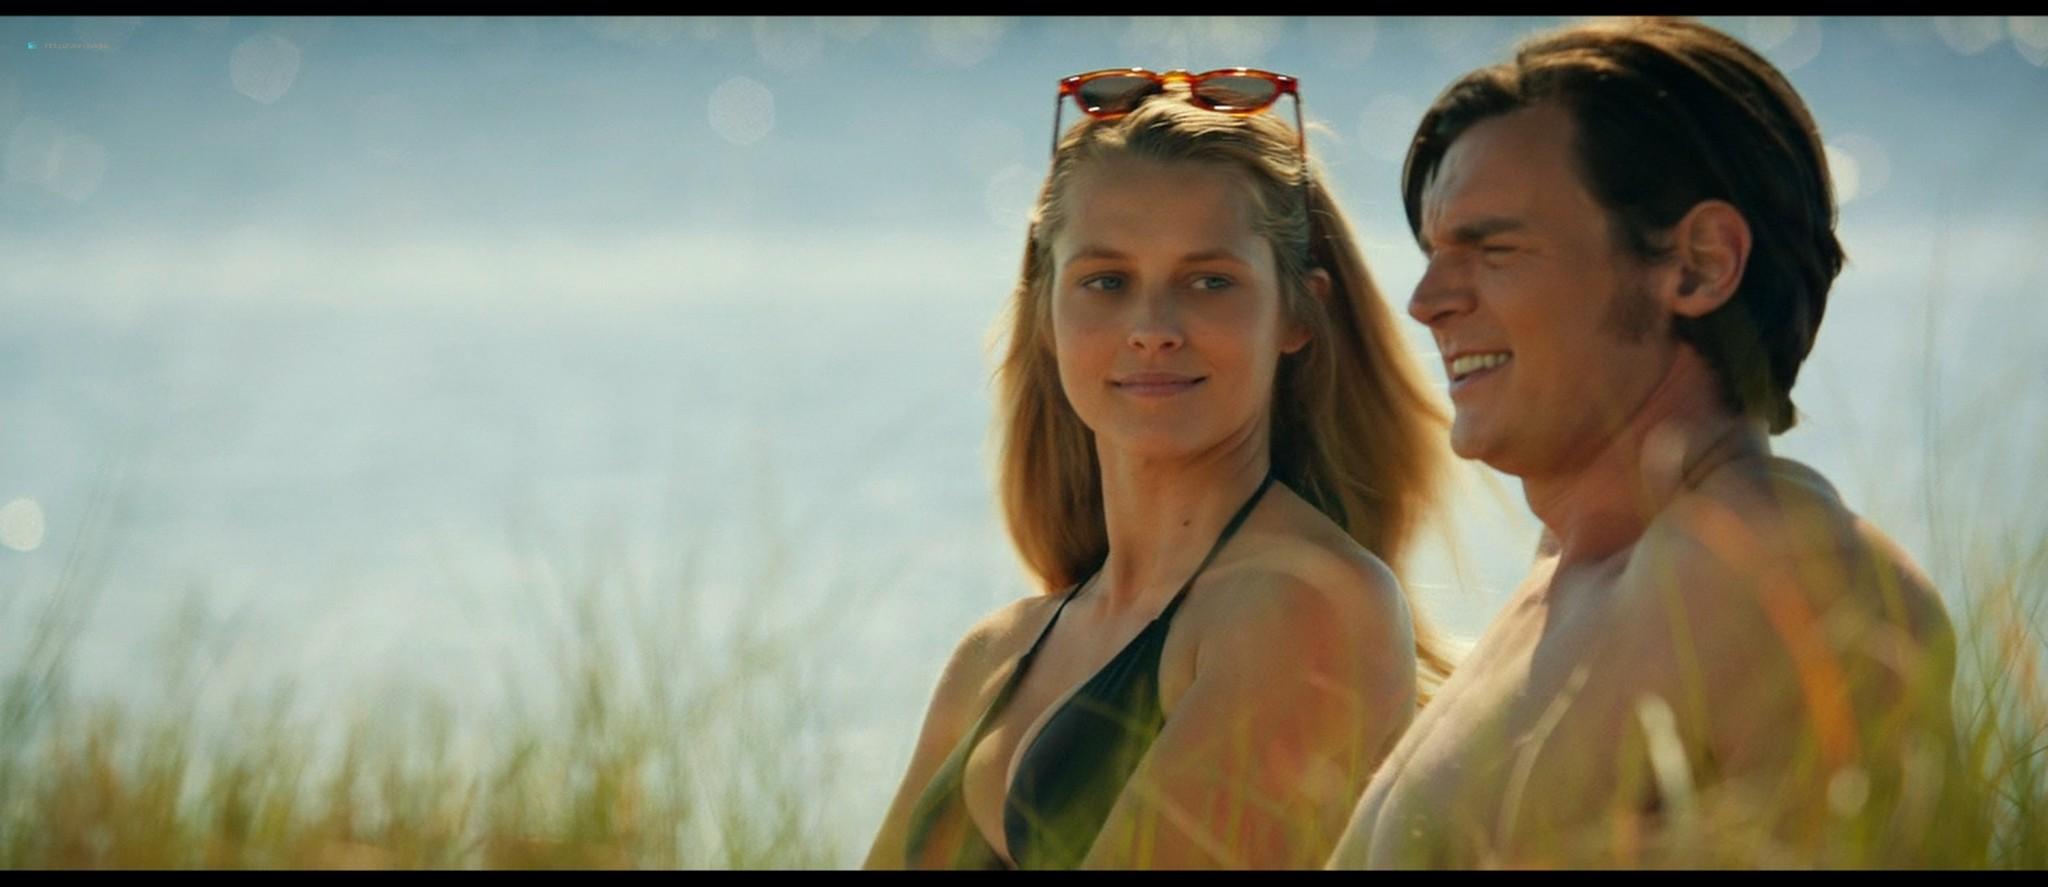 Teresa Palmer hot bikini and Maggie Grace, Alexandra Daddario hot too - The Choice (2016) HD 1080p BluRay (8)